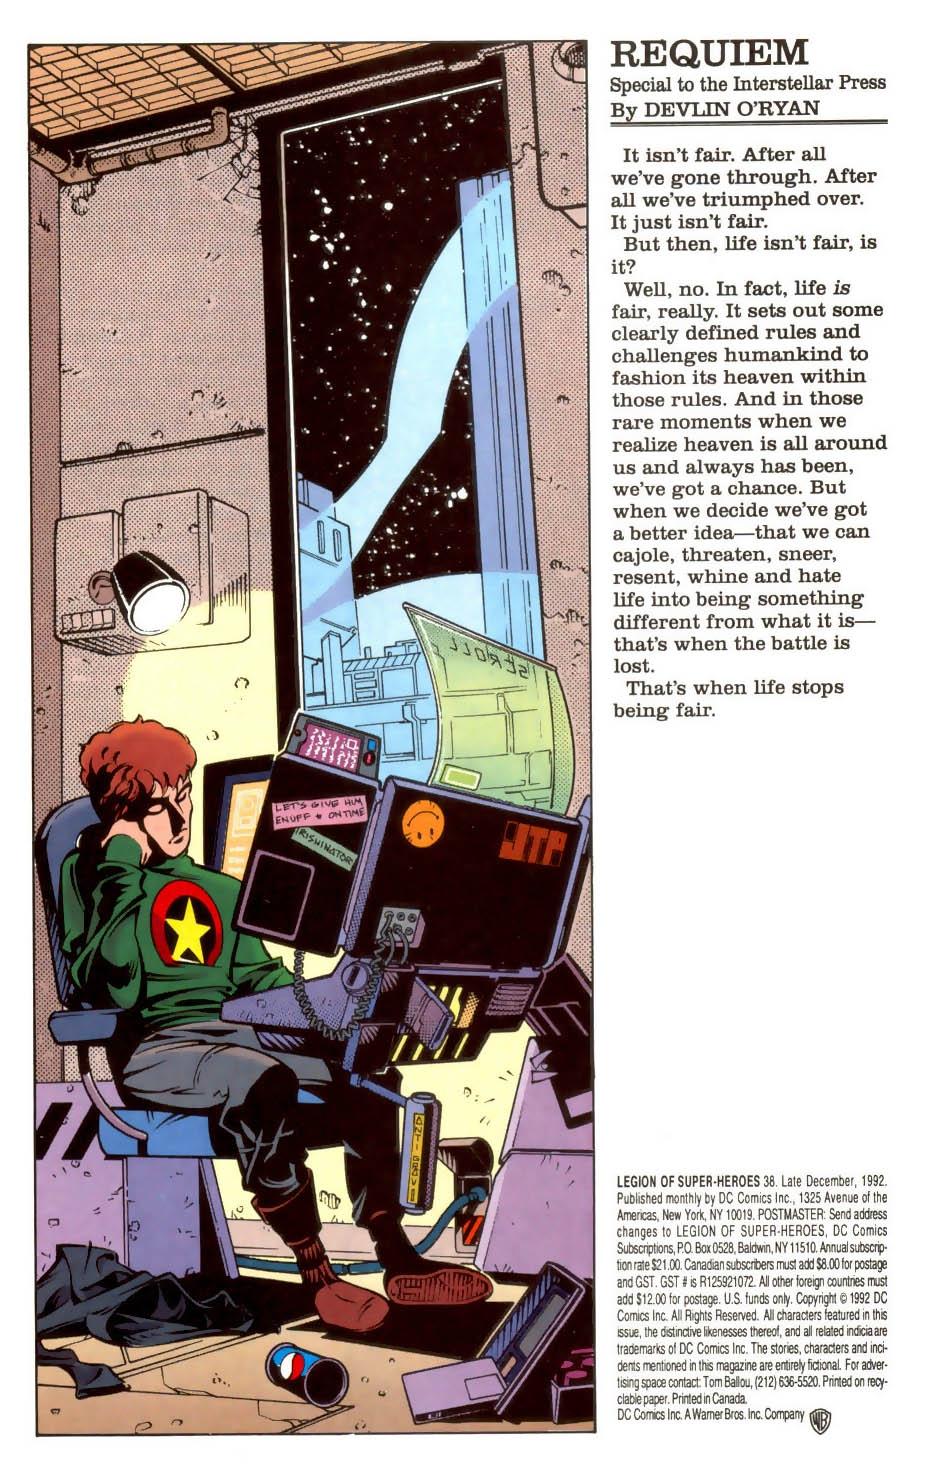 Legion of Super-Heroes #38 – Reviews of Old Comics